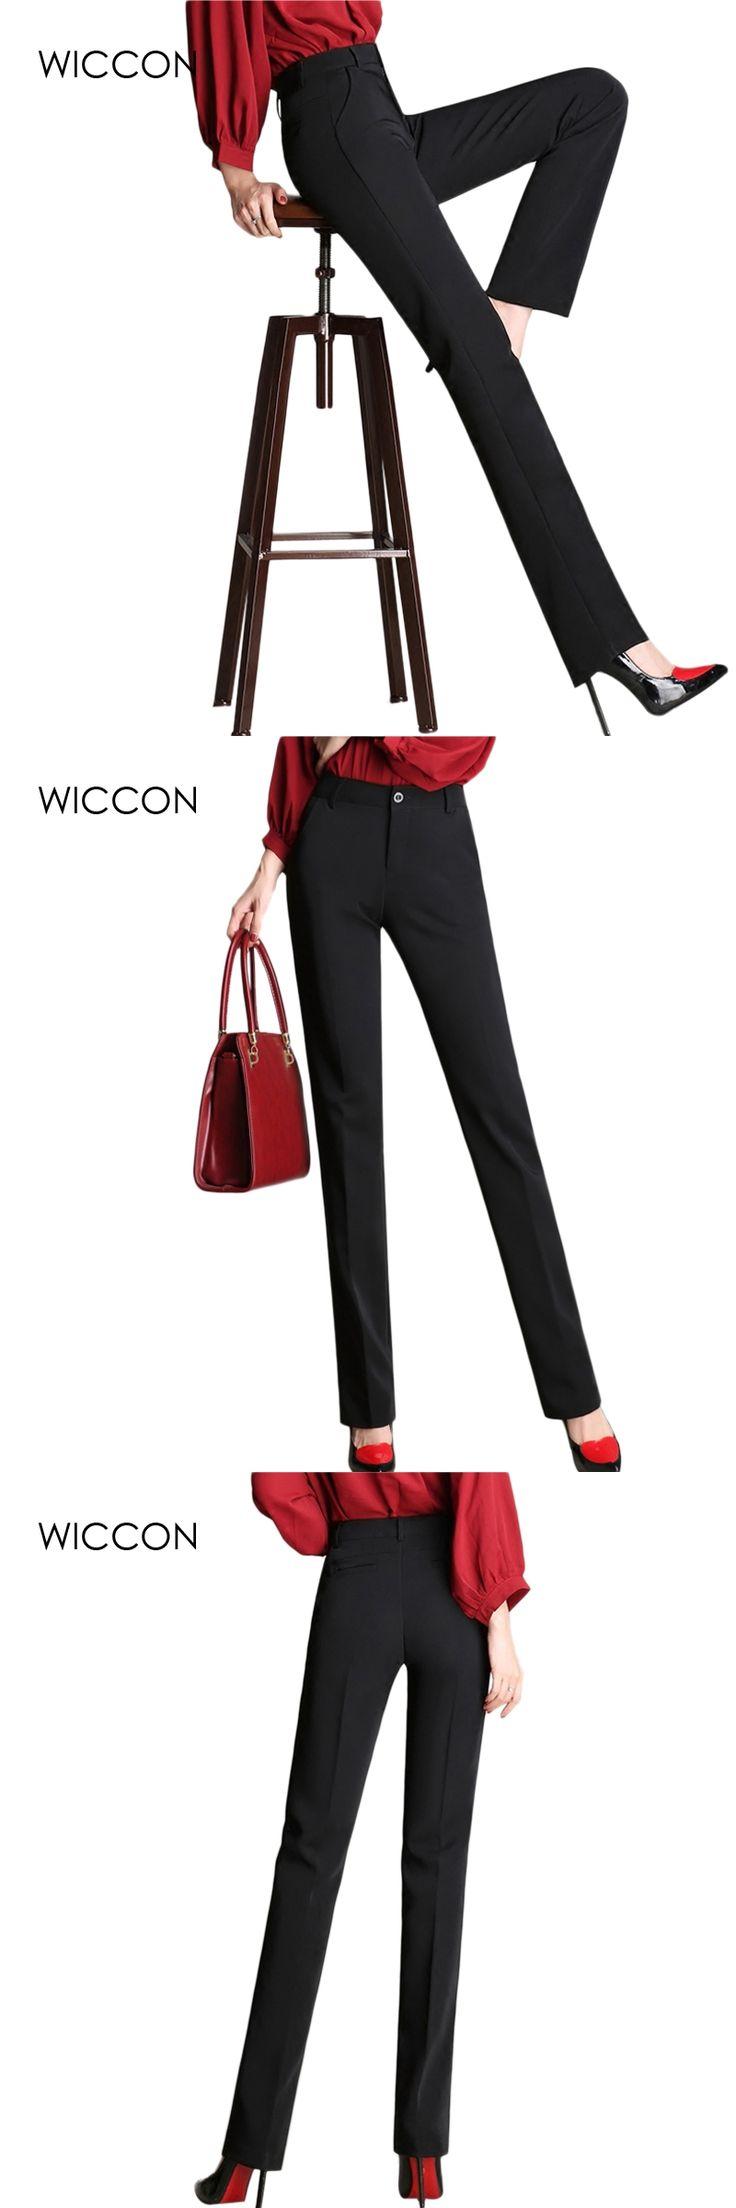 office pants Women Straight Pants Plus Size OL Suit Pants New Fashion Western-Style Trousers Black Casual Work Pants S-4XL